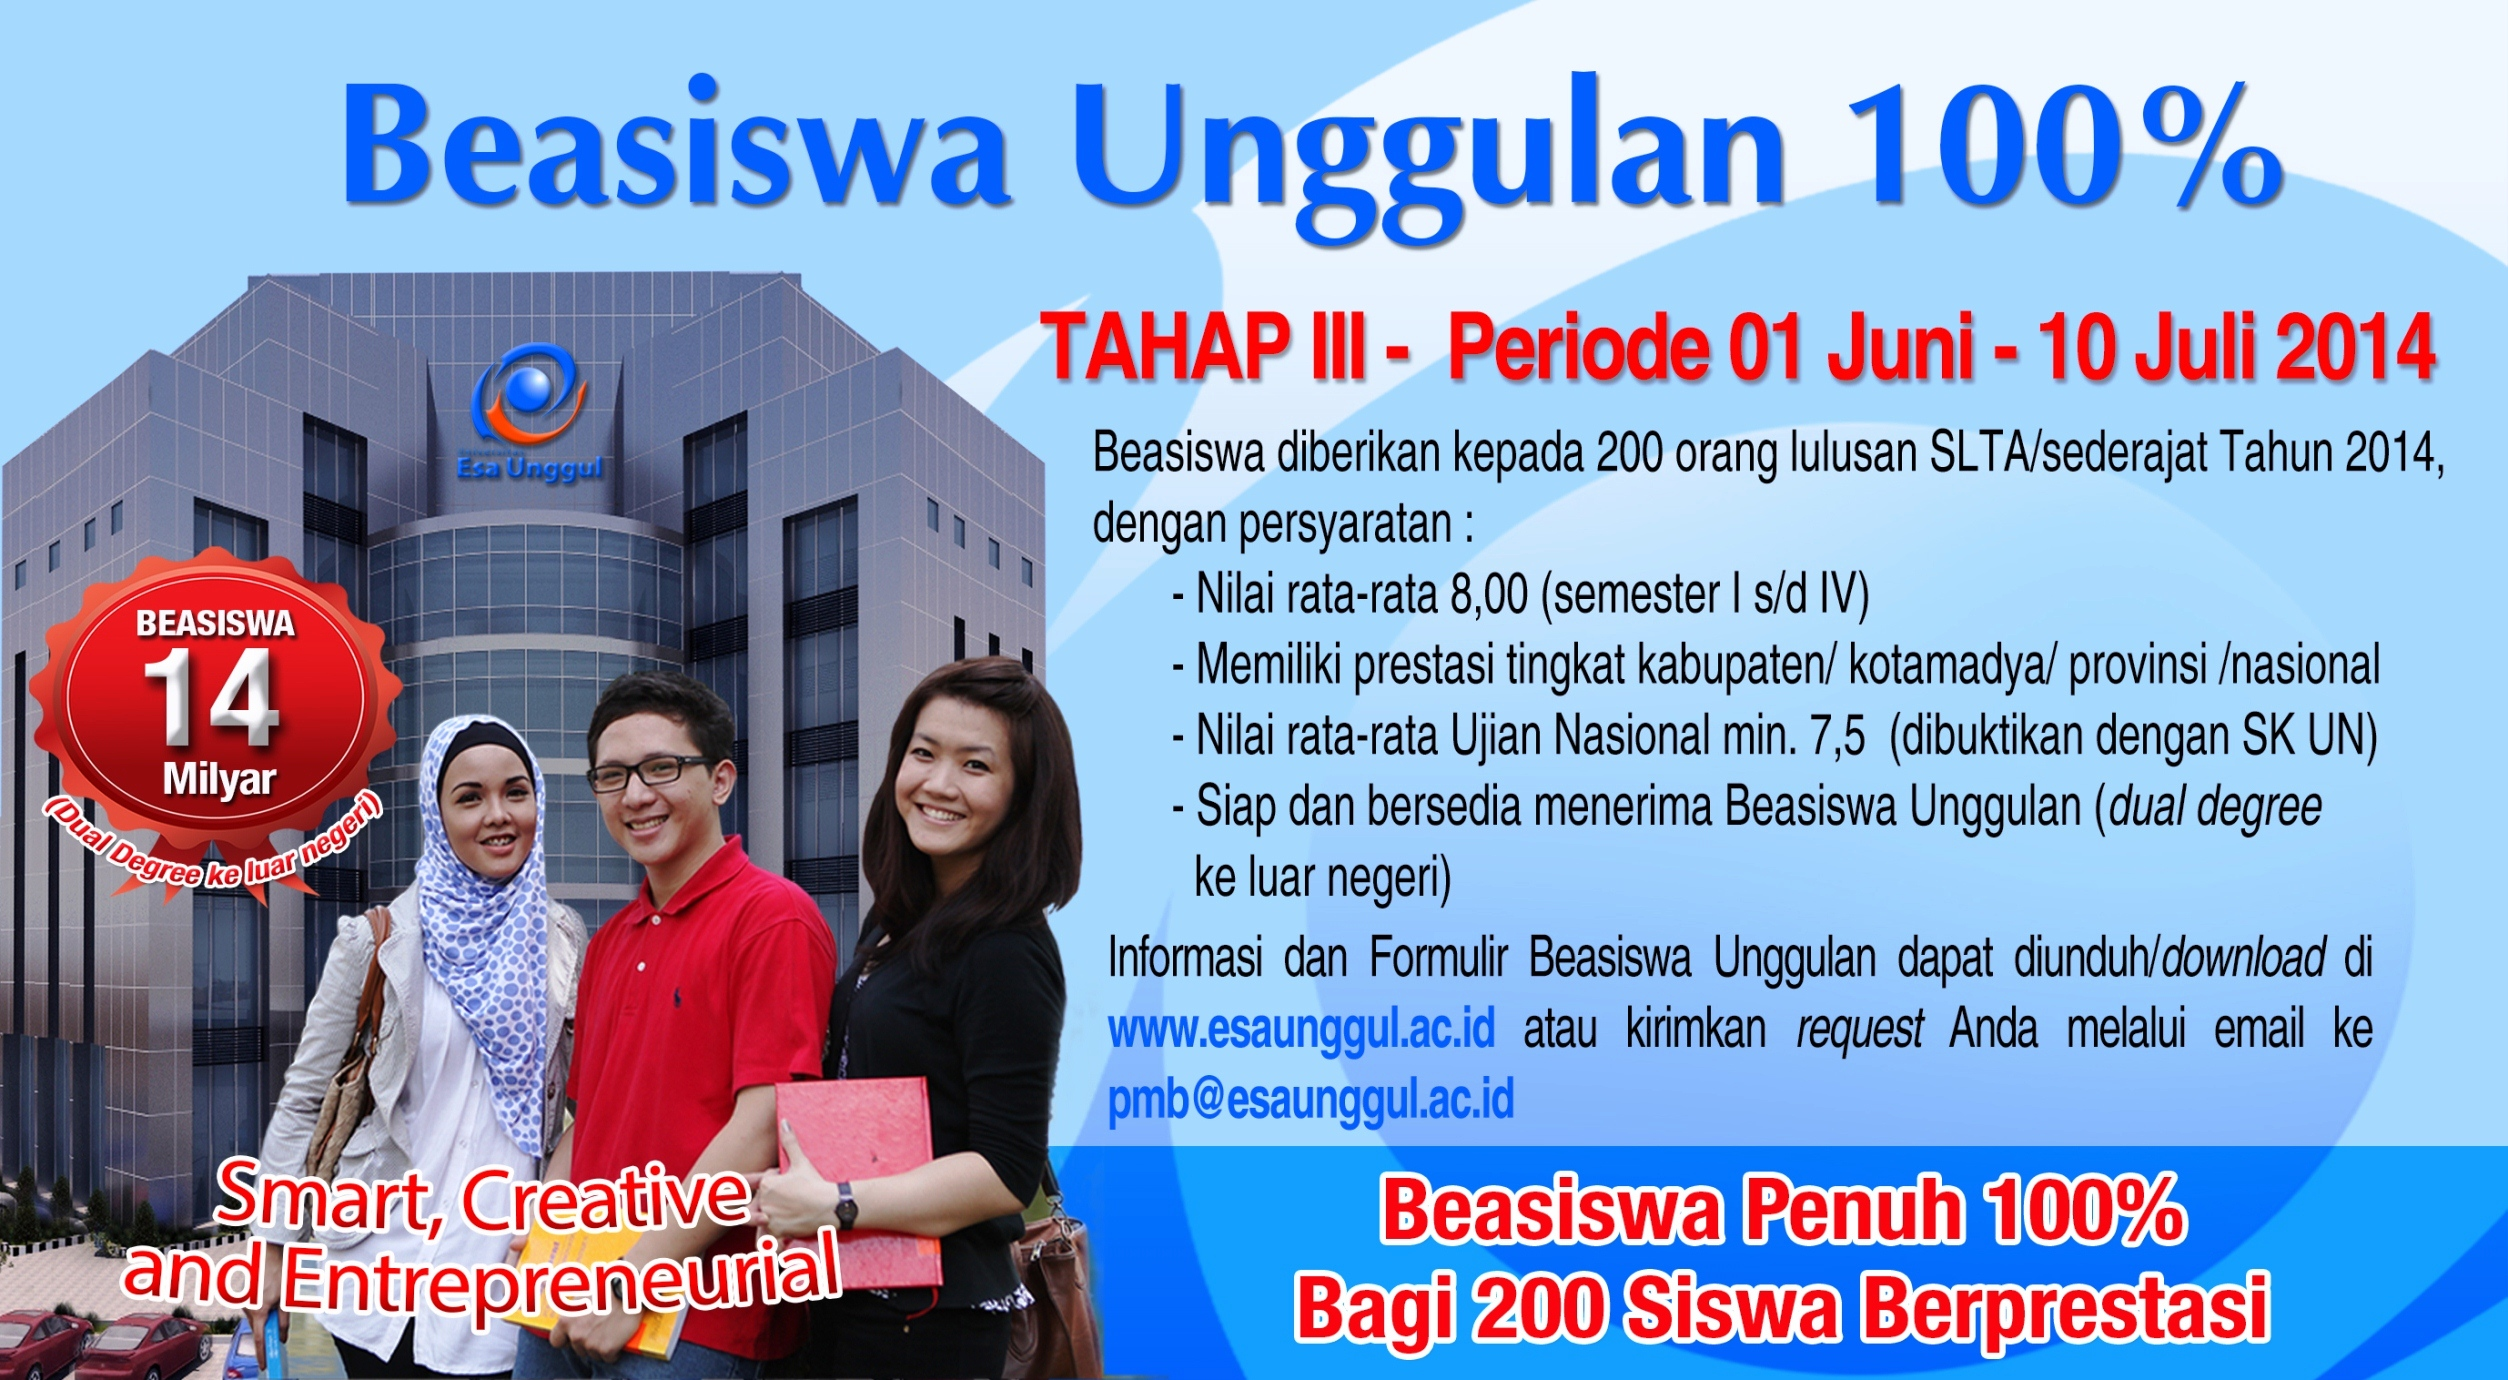 Nomor Induk Mahasiswa (NIM) Penerima Beasiswa Unggulan 100%